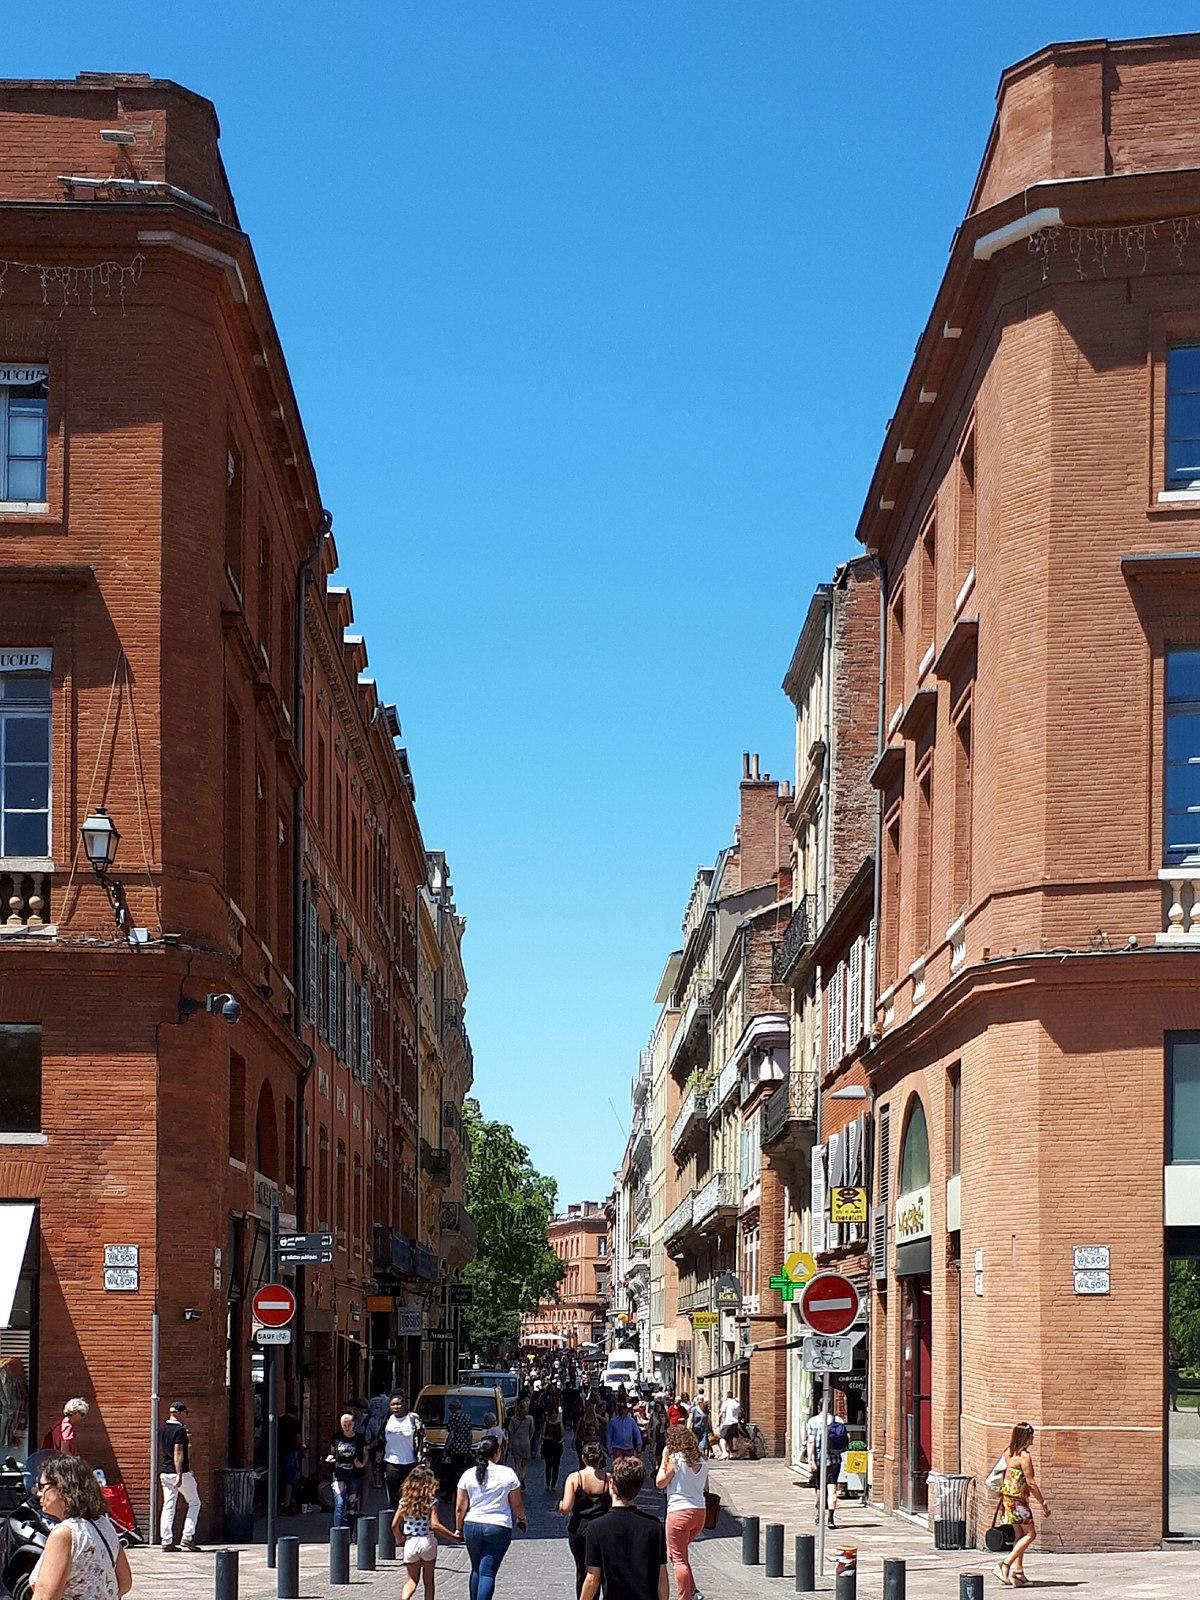 Rue Lafayette Toulouse : rue lafayette toulouse wikip dia ~ Medecine-chirurgie-esthetiques.com Avis de Voitures